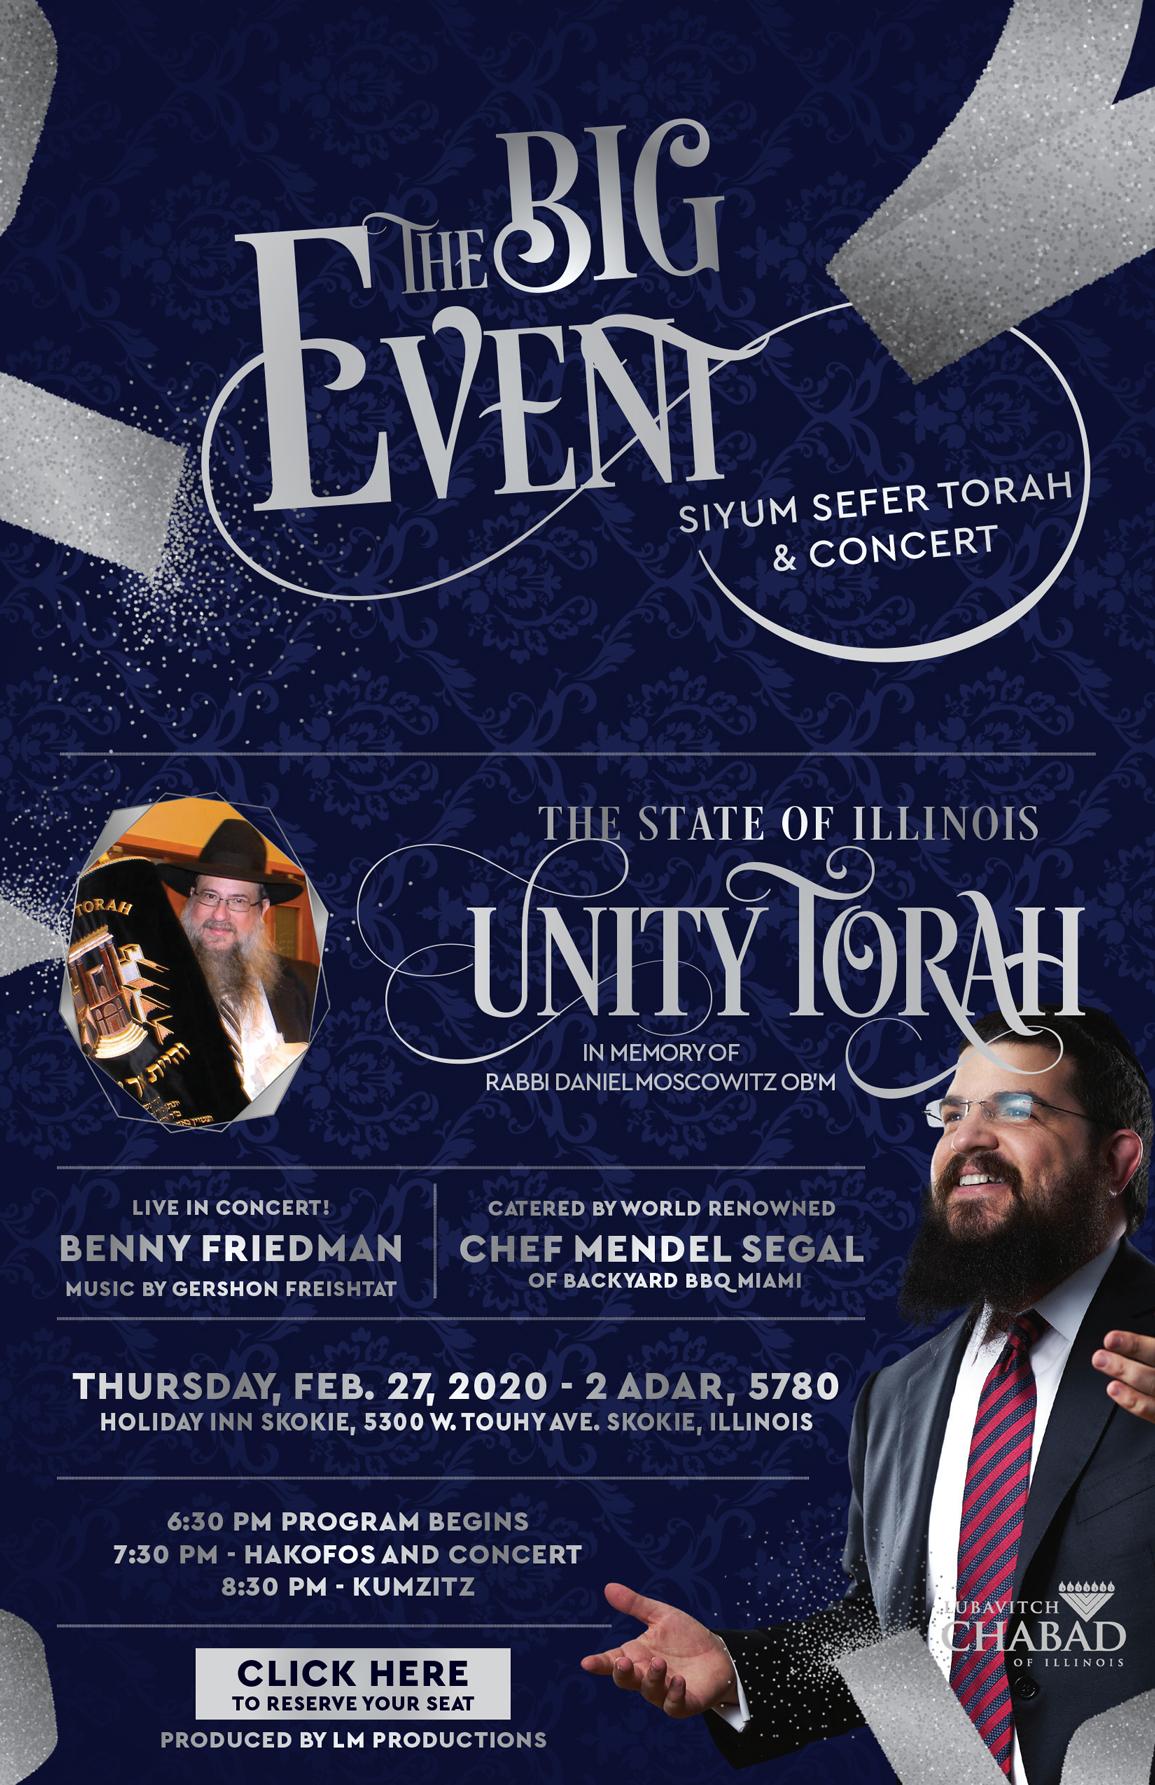 CI-Unity-Torah-Mini-Site-Info.jpg